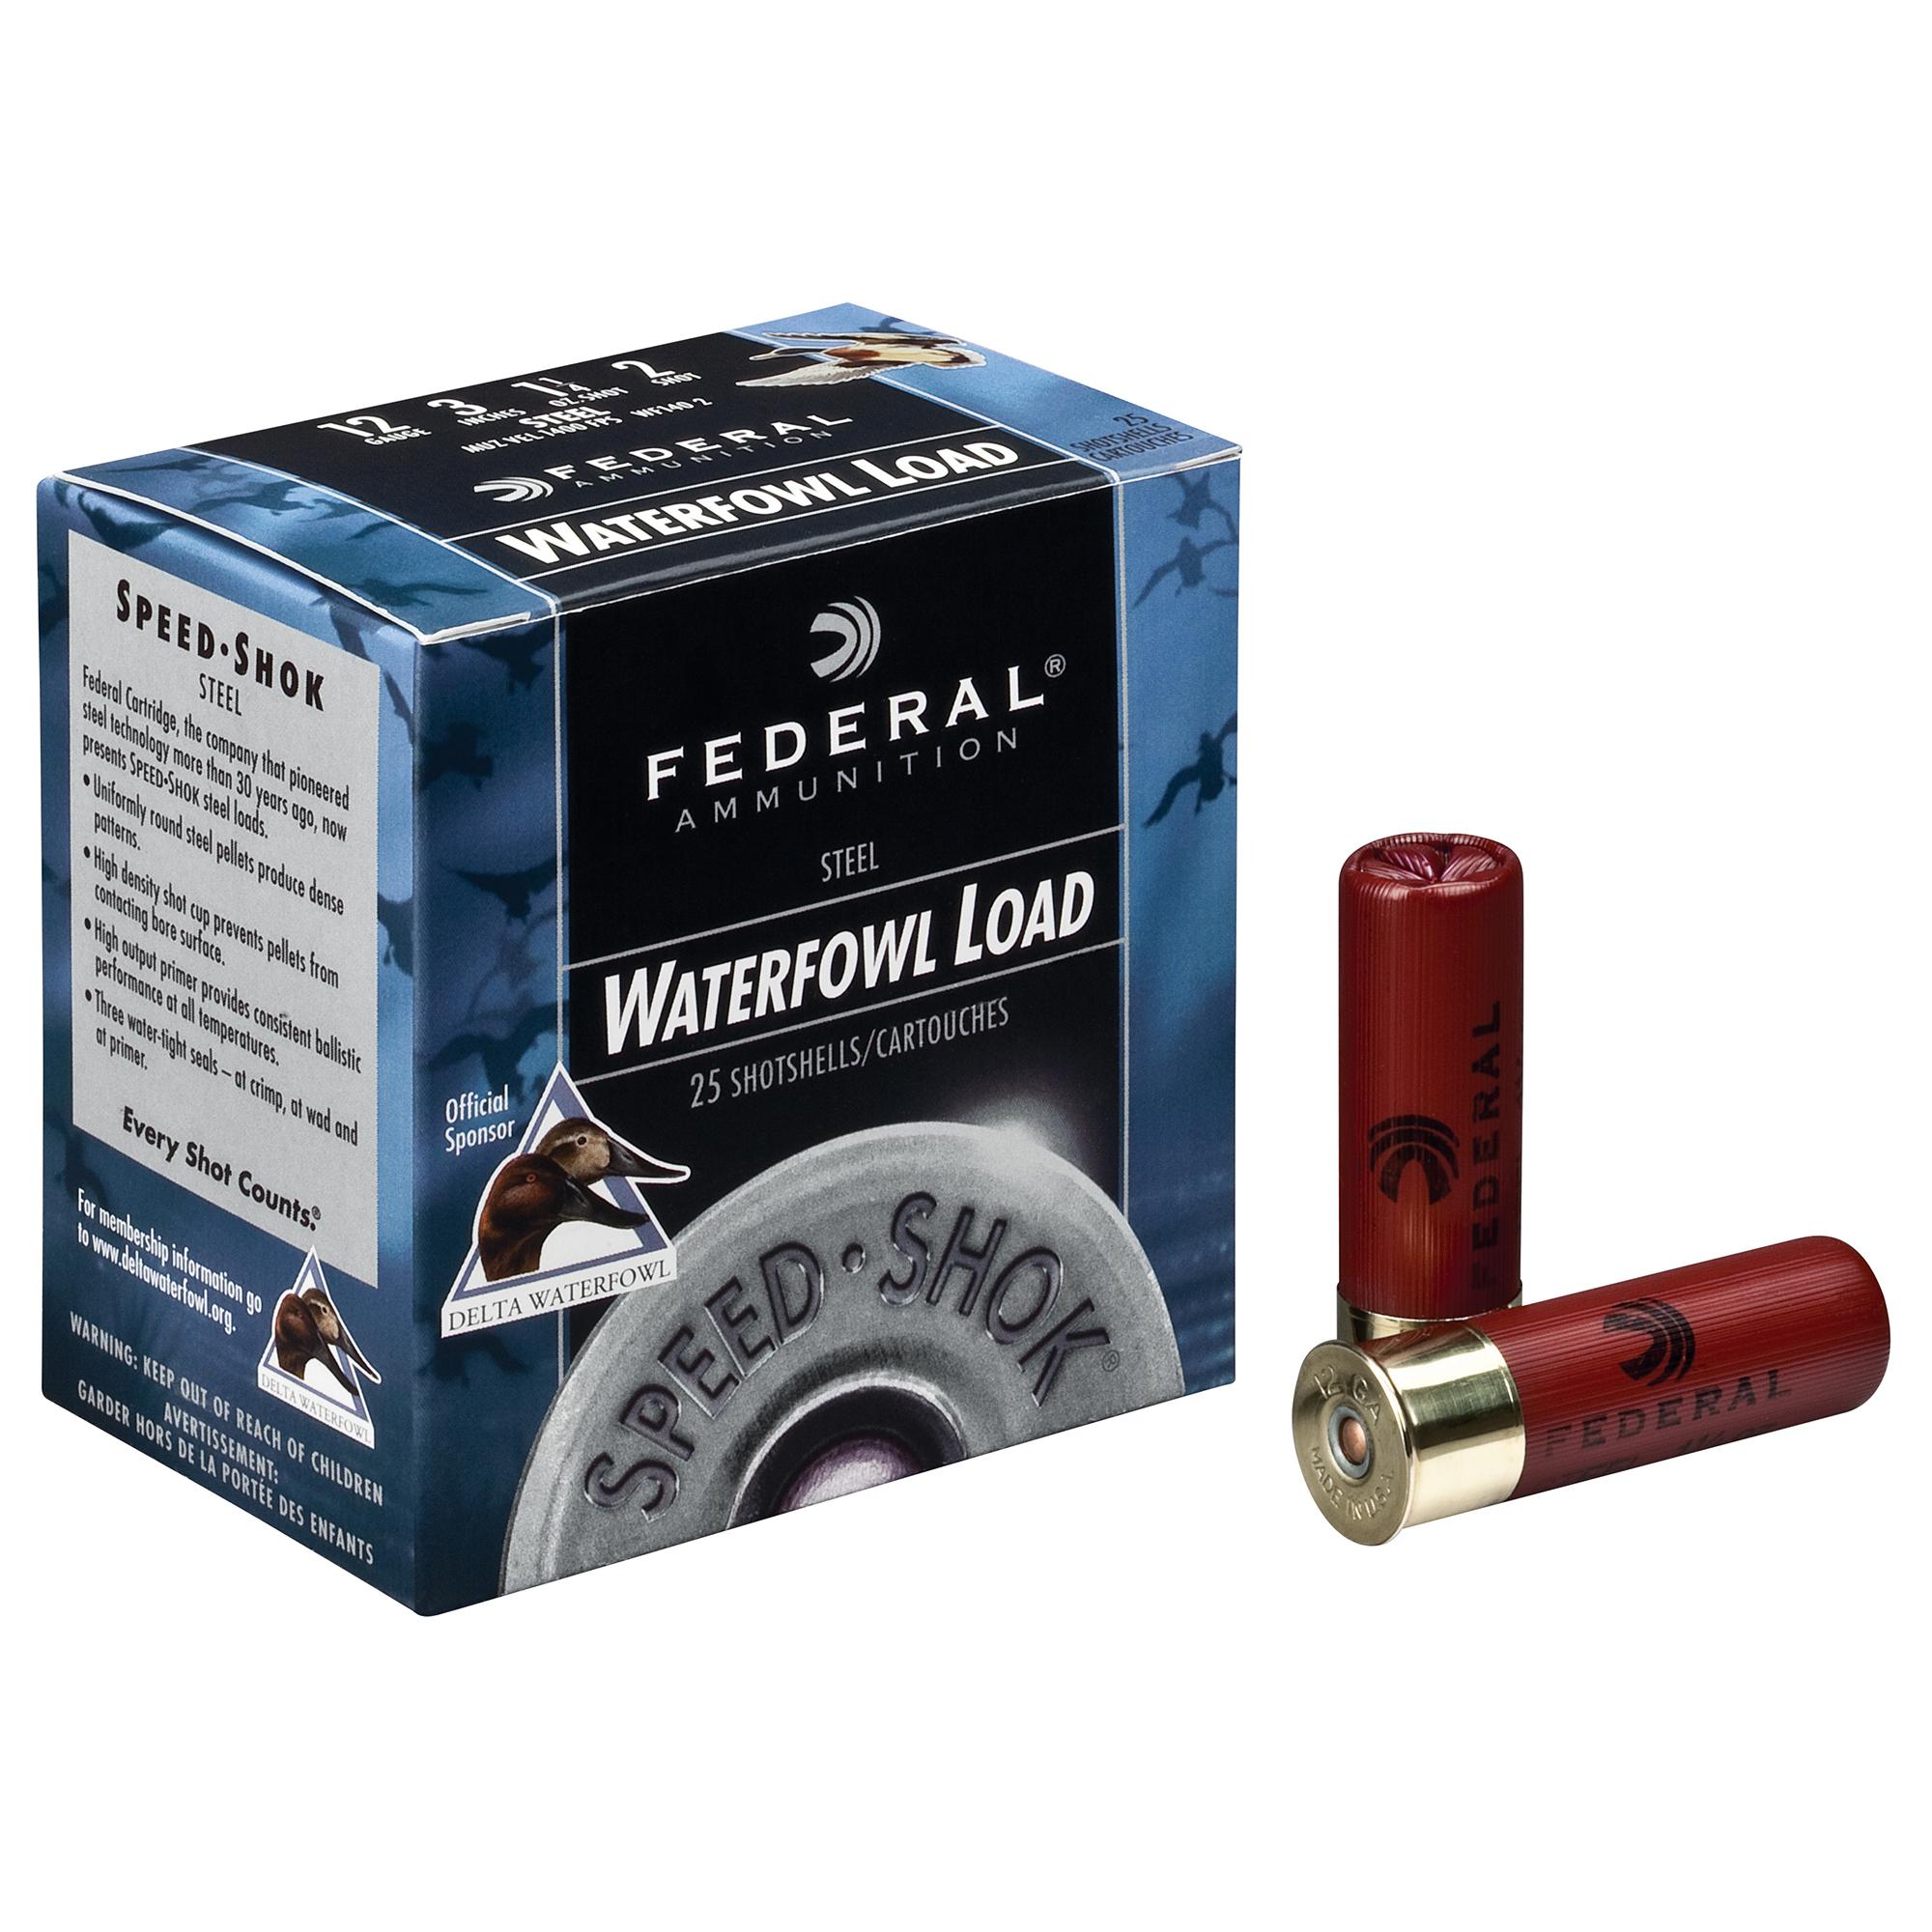 Federal Premium Speed-Shok Steel Waterfowl Loads, 12-ga, 3-1/2″, 1-3/8 oz, #2